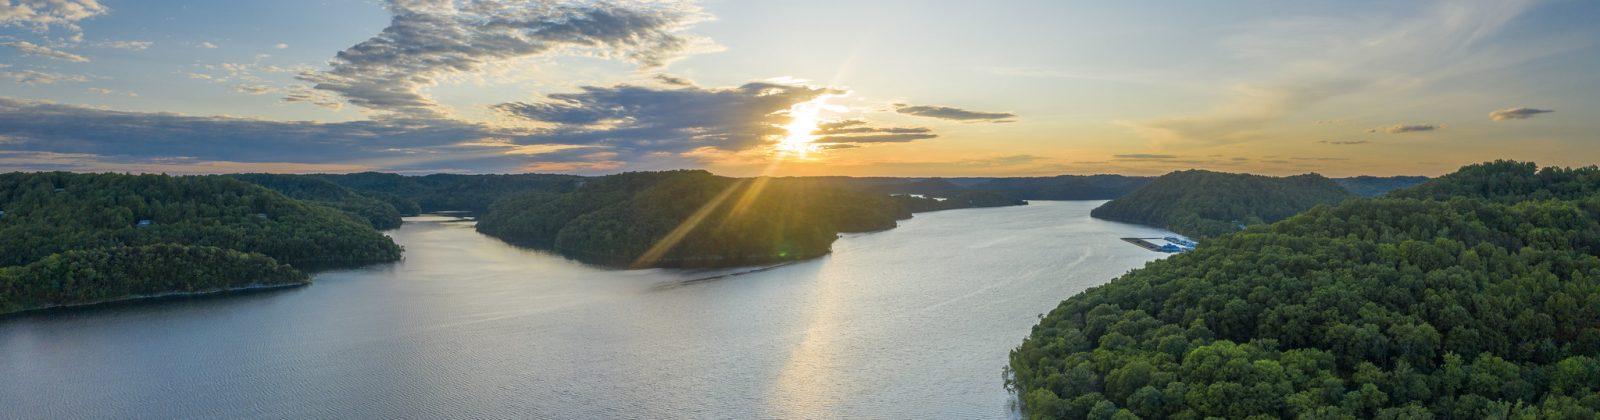 Center Hill Lake | Image by Chuck Sutherland - http://chuck-sutherland.blogspot.com/